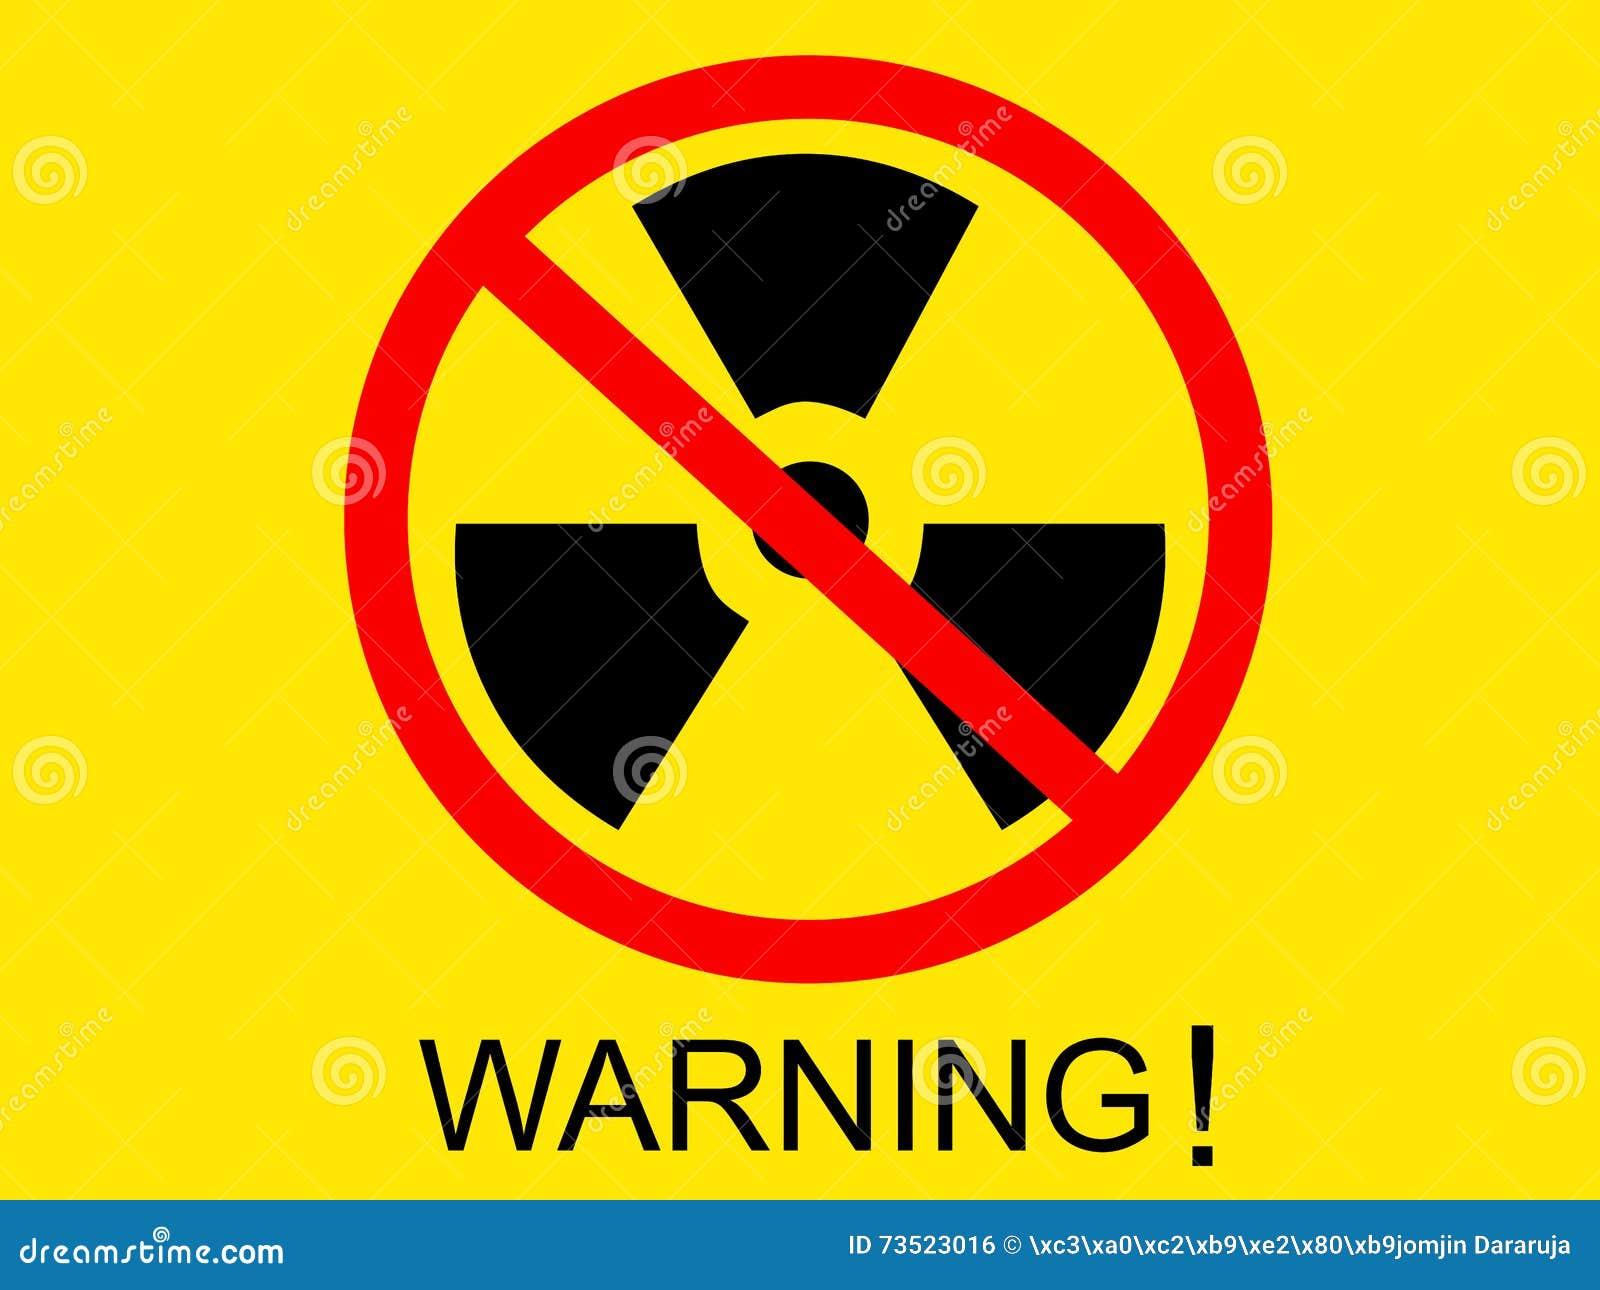 Warning radiation icon symbol black on yellow screen with warning warning radiation icon symbol black on yellow screen with warning word buycottarizona Choice Image